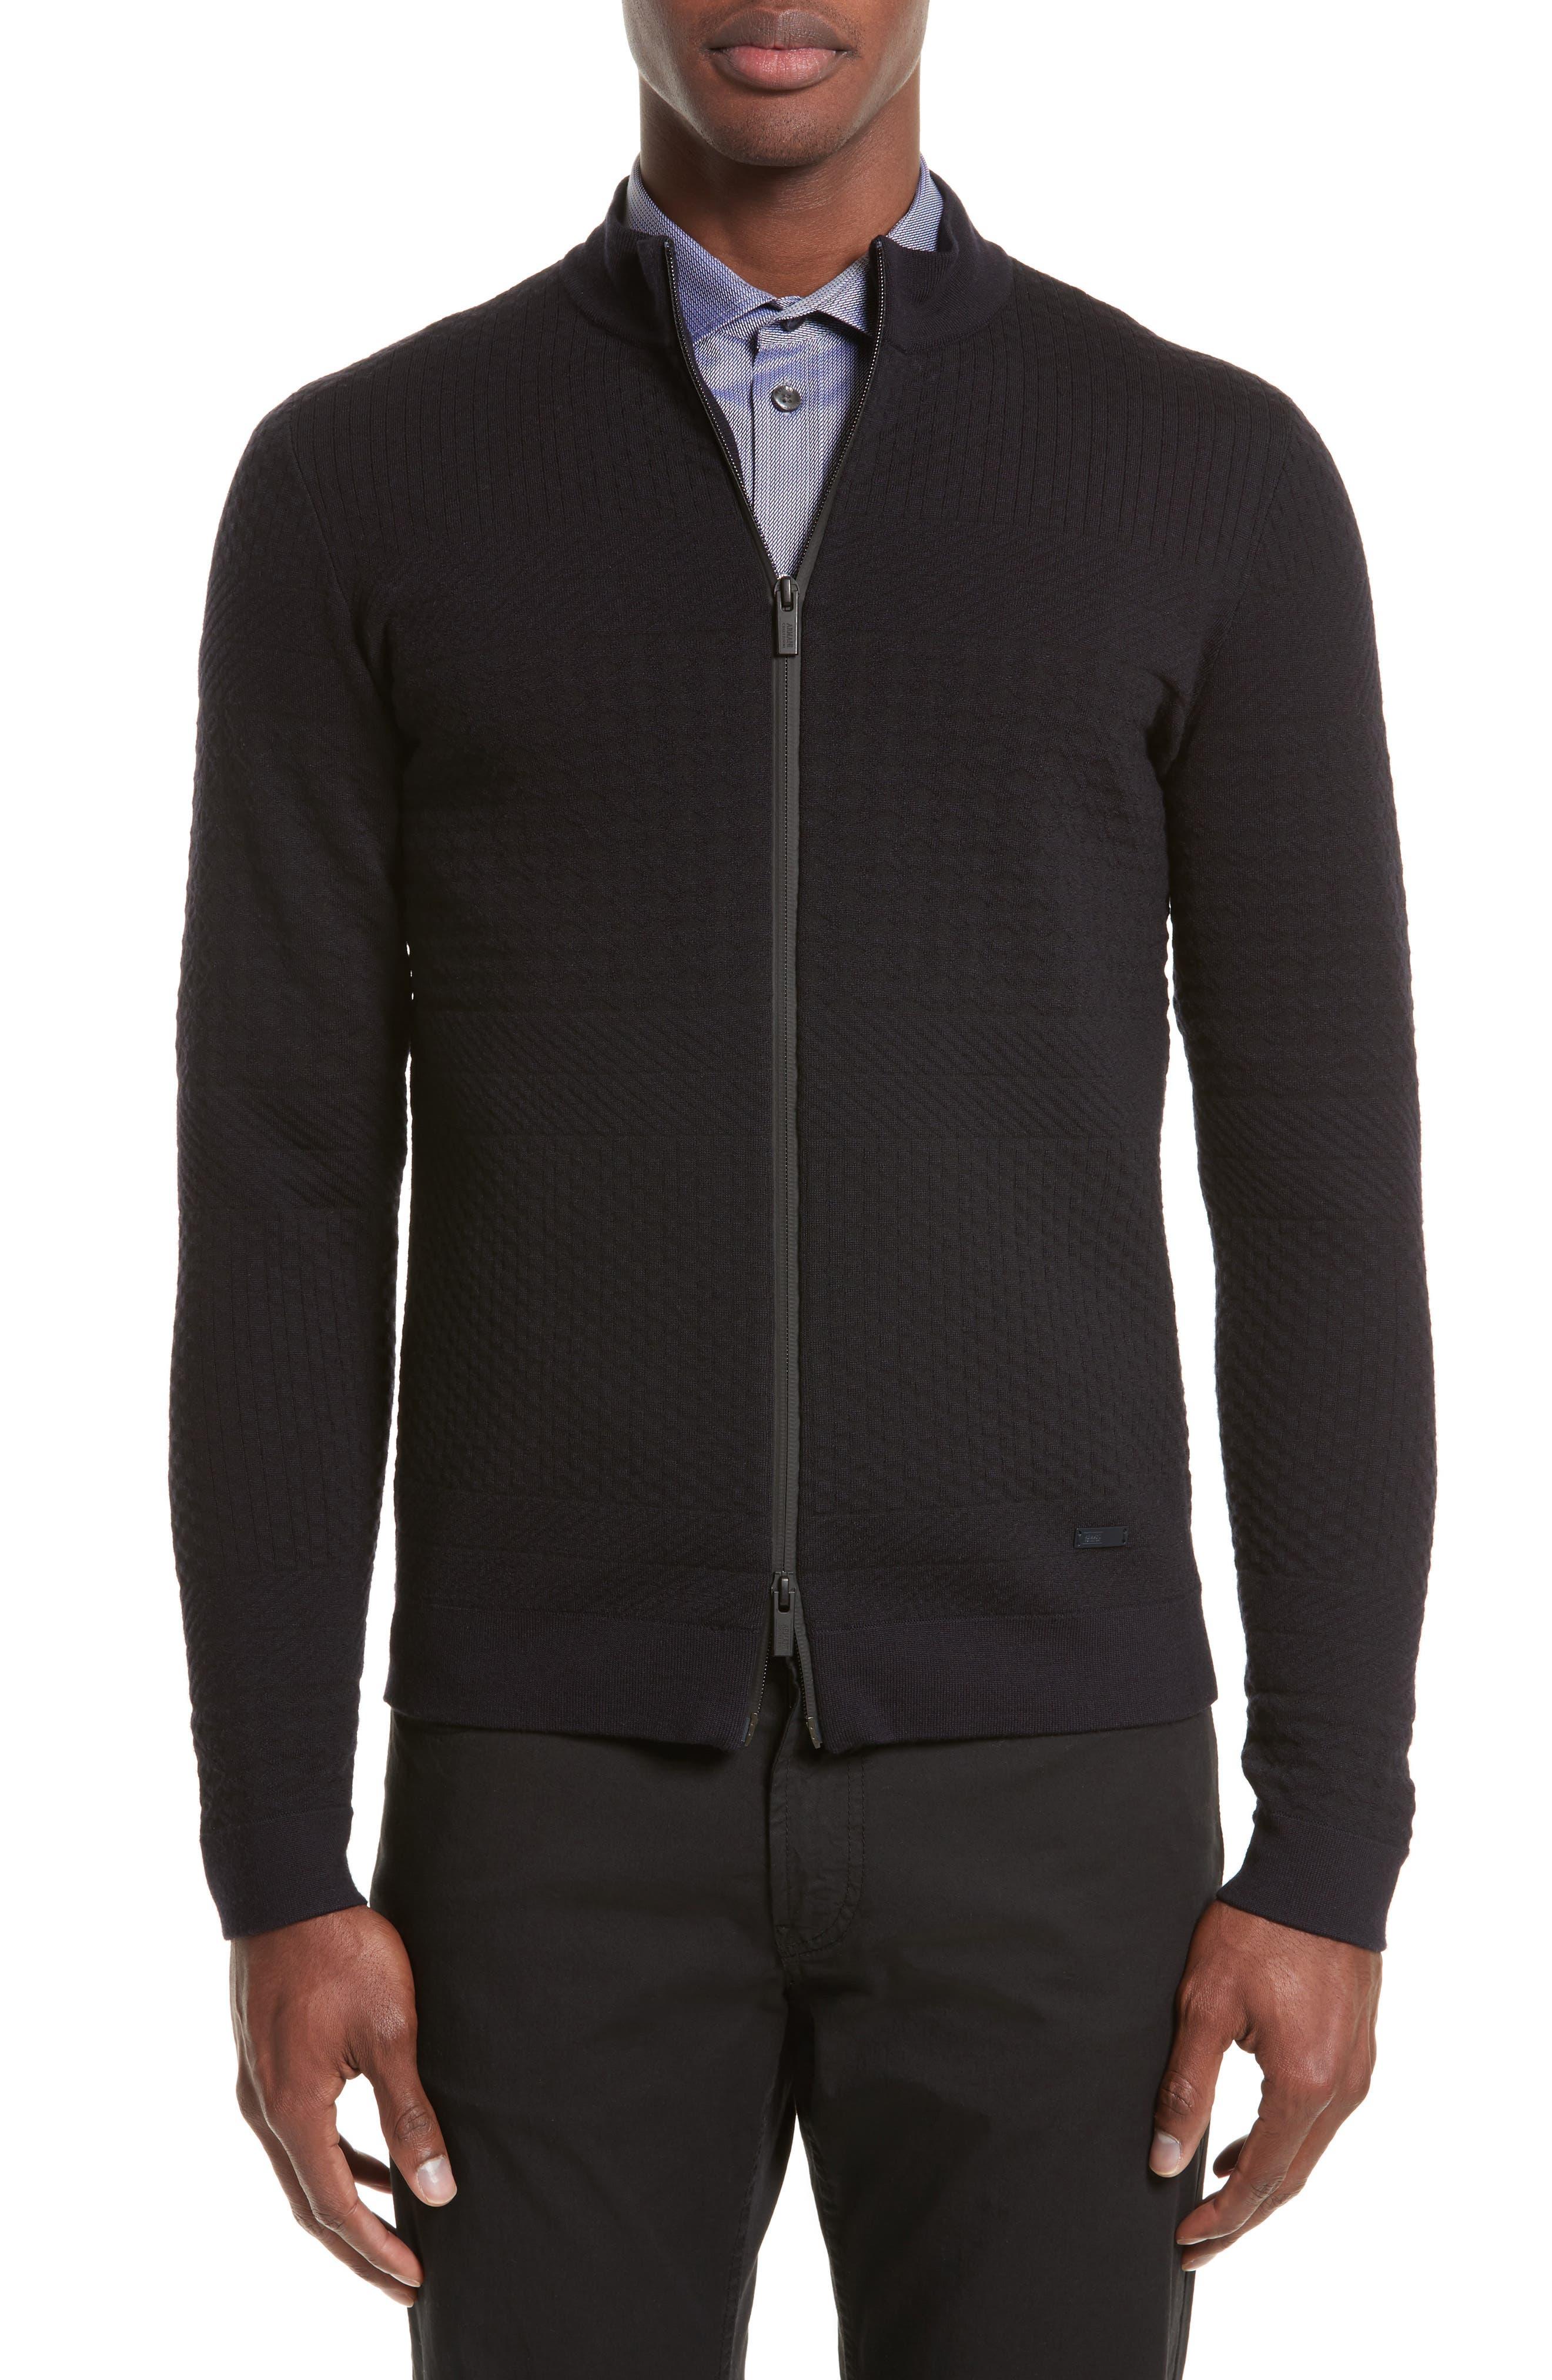 Alternate Image 1 Selected - Armani Collezioni Full Zip Jacquard Sweater